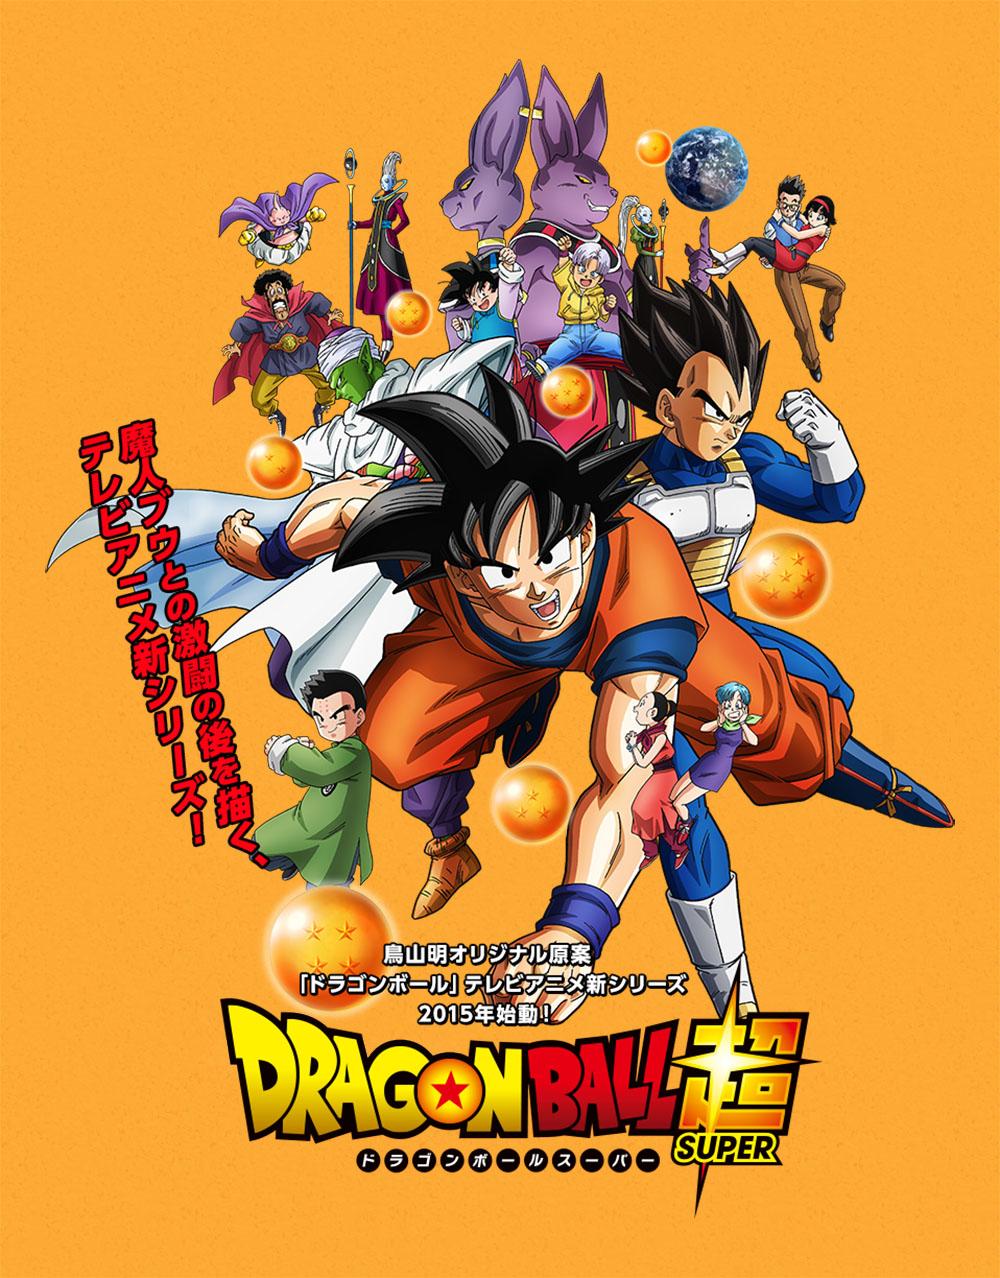 Dragon Ball Super - Teaser Trailer